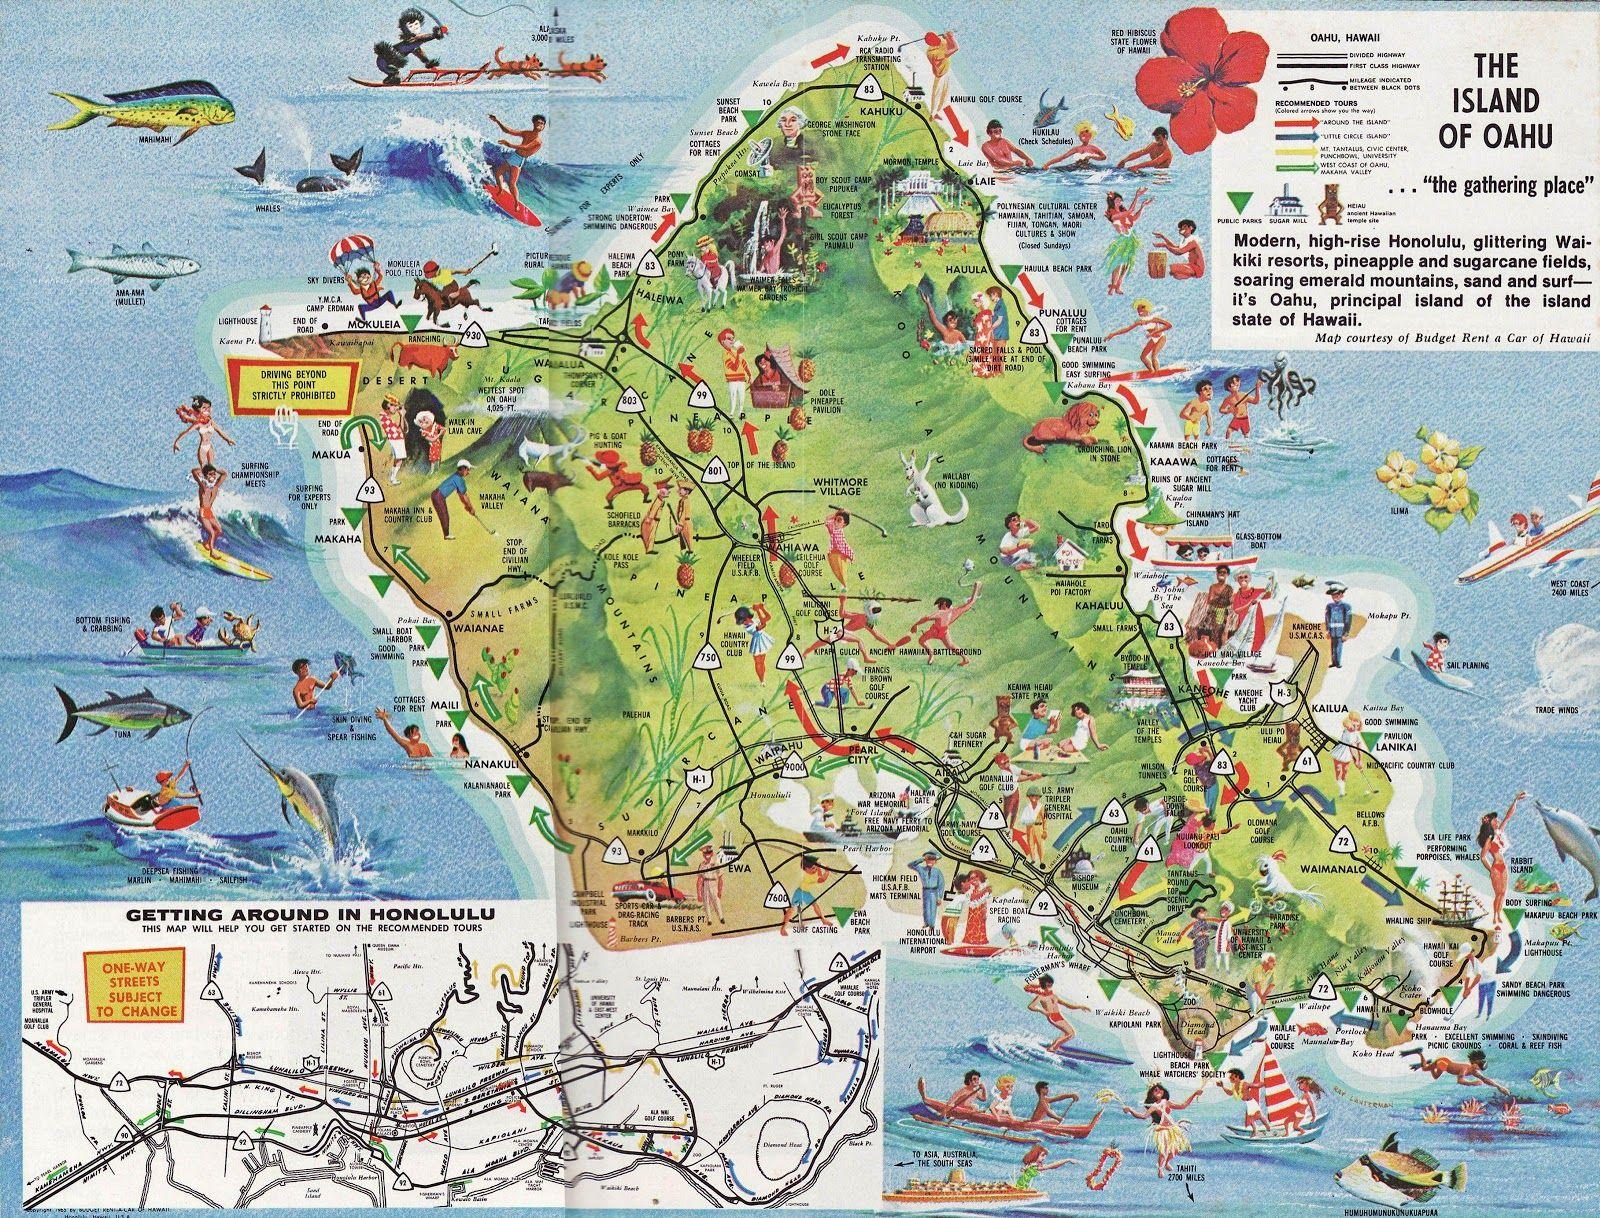 map of oahu attractions Oahu Tourist Map Jpg 1600 1218 Oahu Map Tourist Map Oahu Hawaii Map map of oahu attractions